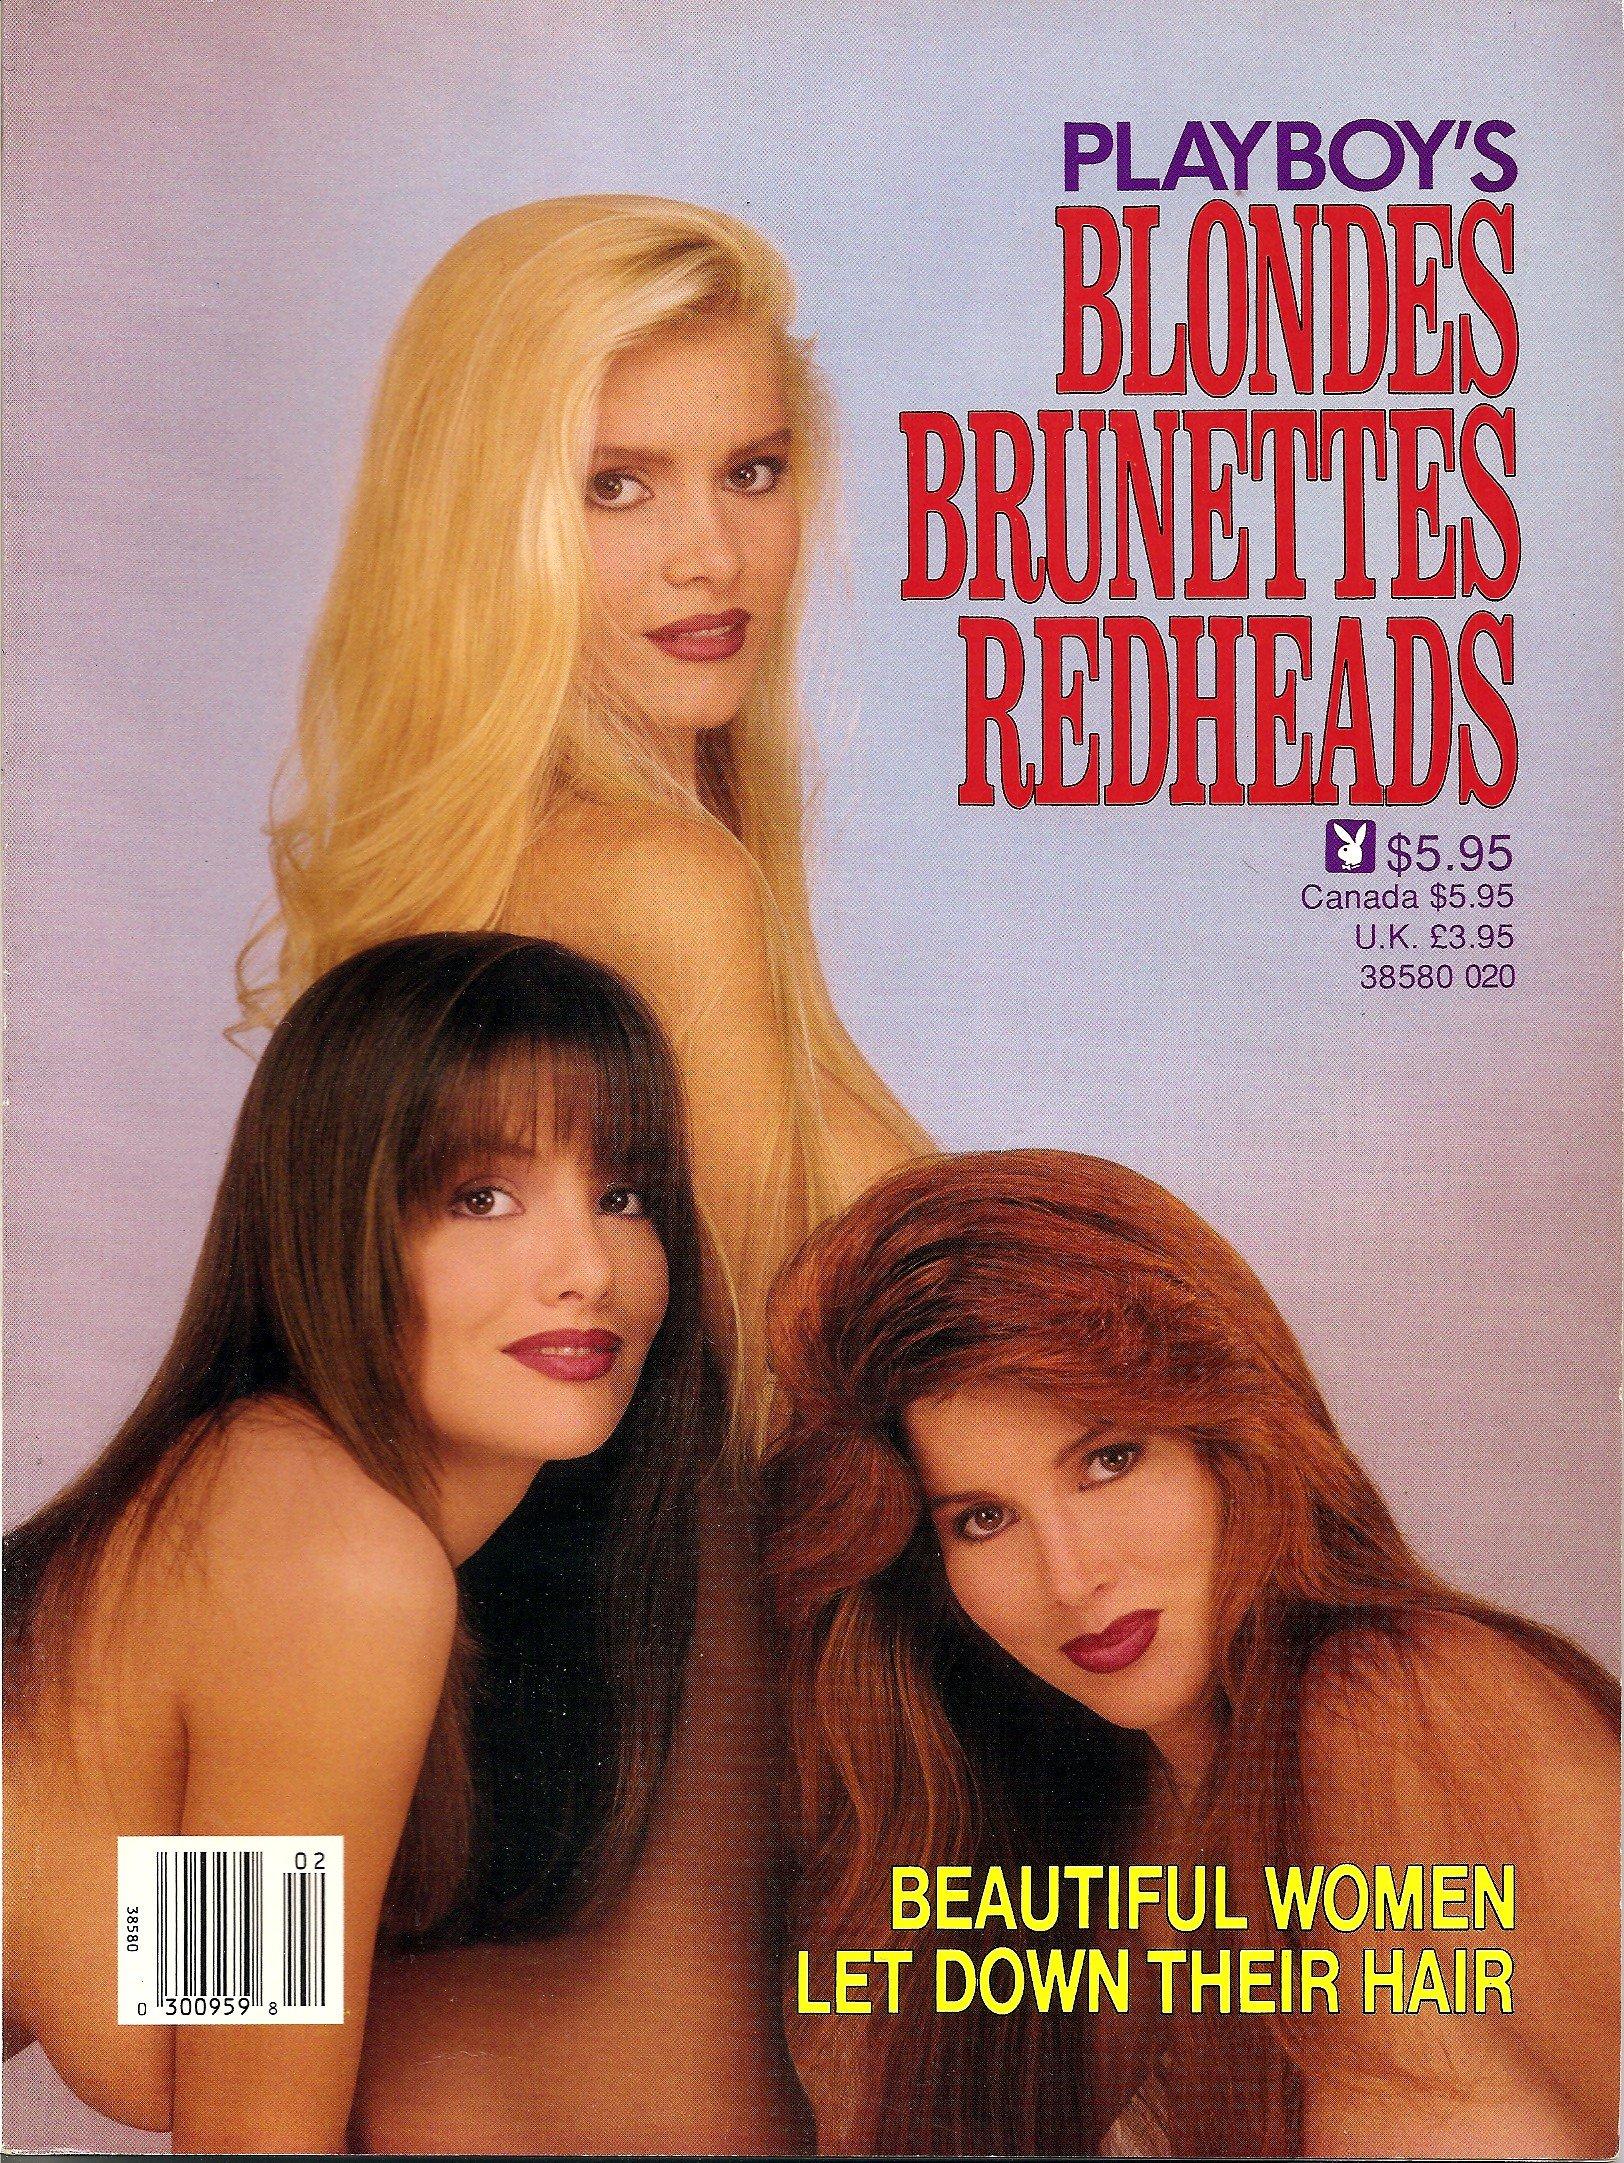 Blonde brunette playboy redhead images 135